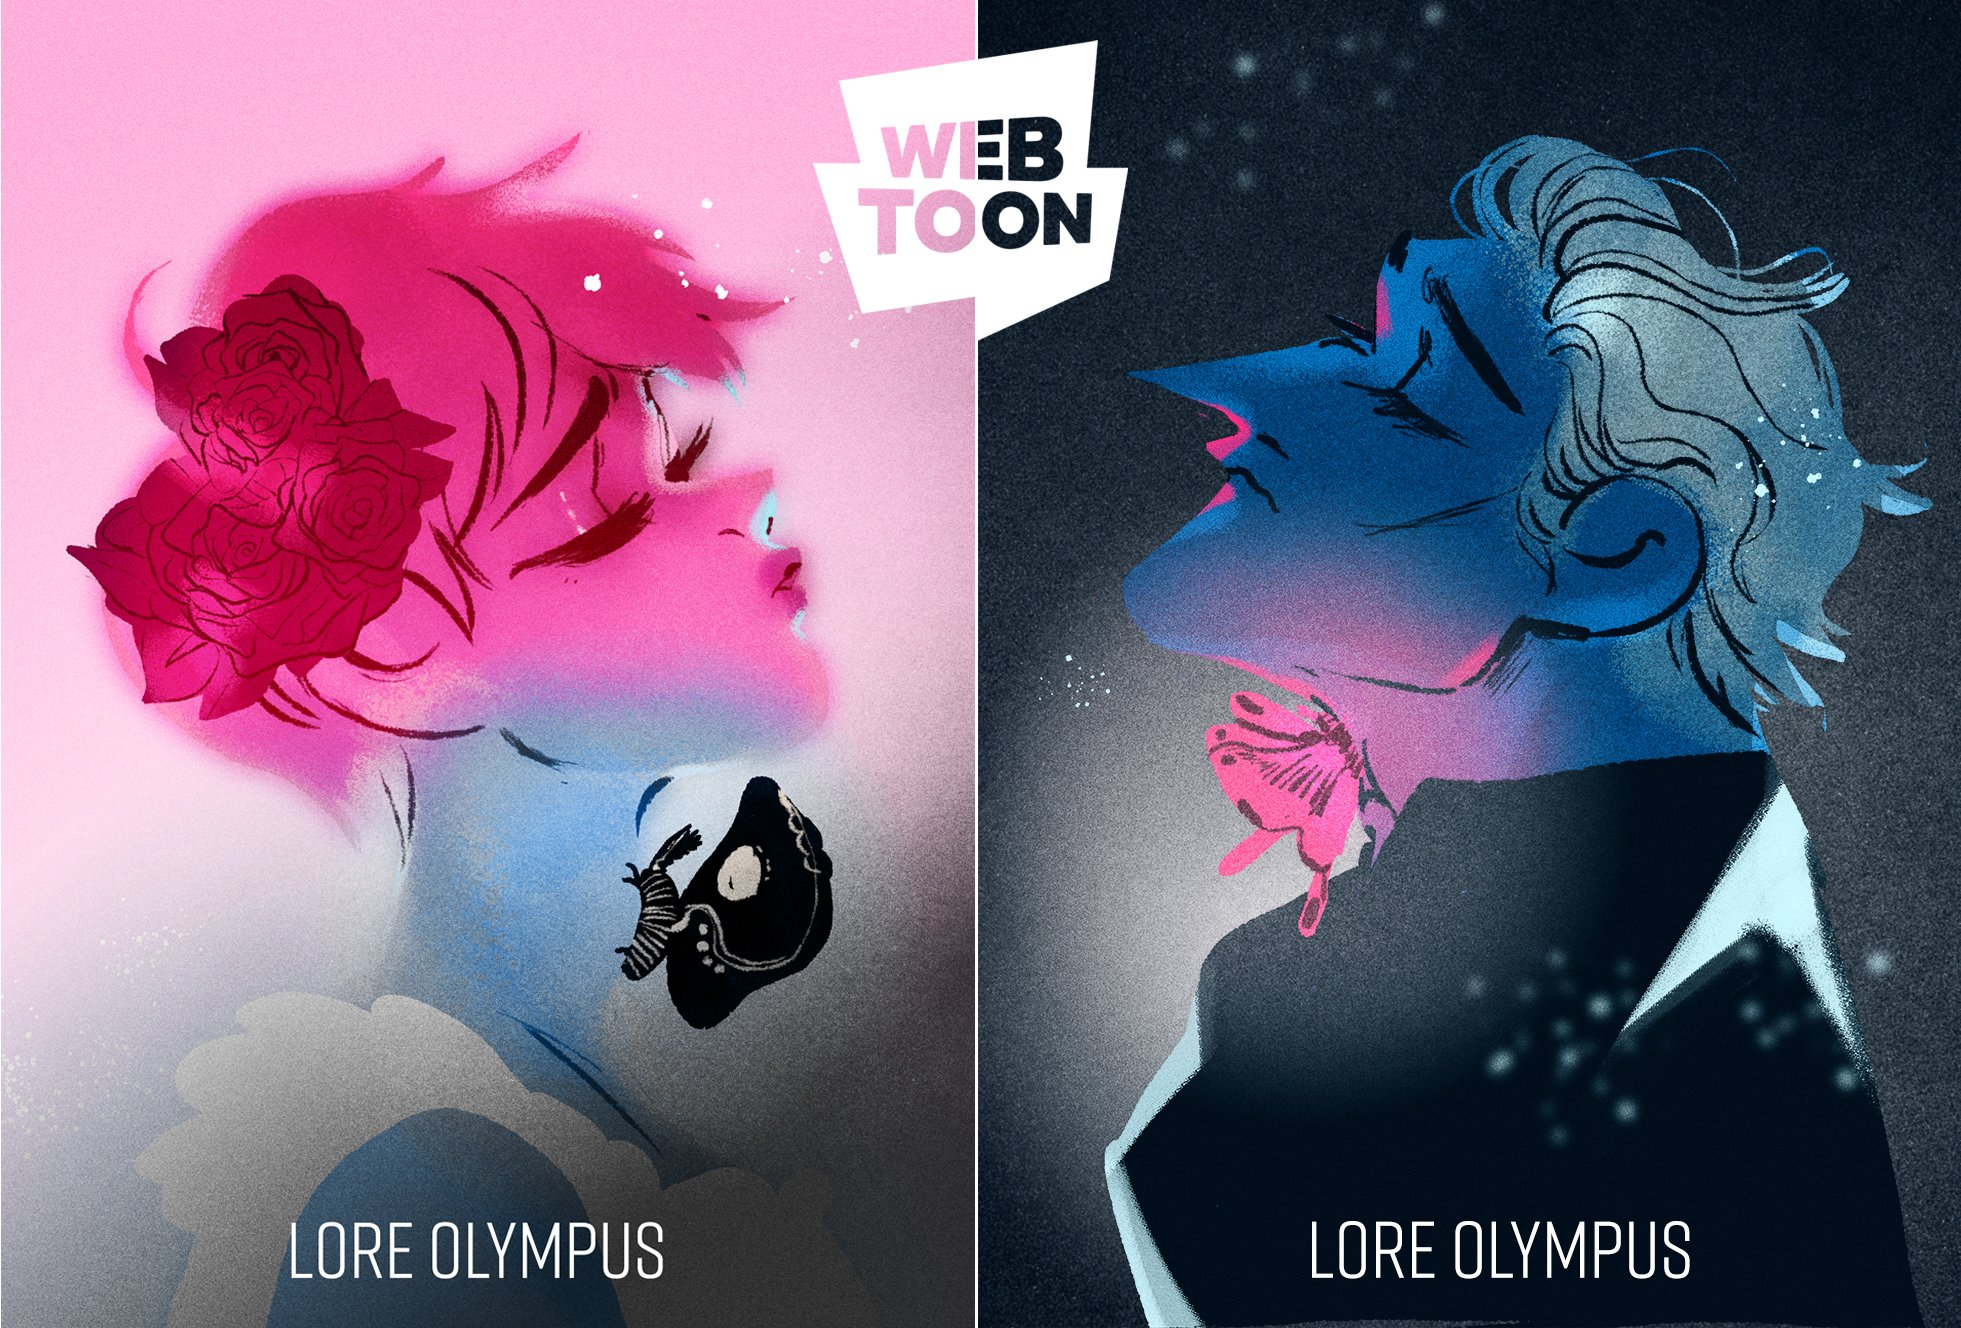 Lore Olympus Wiki